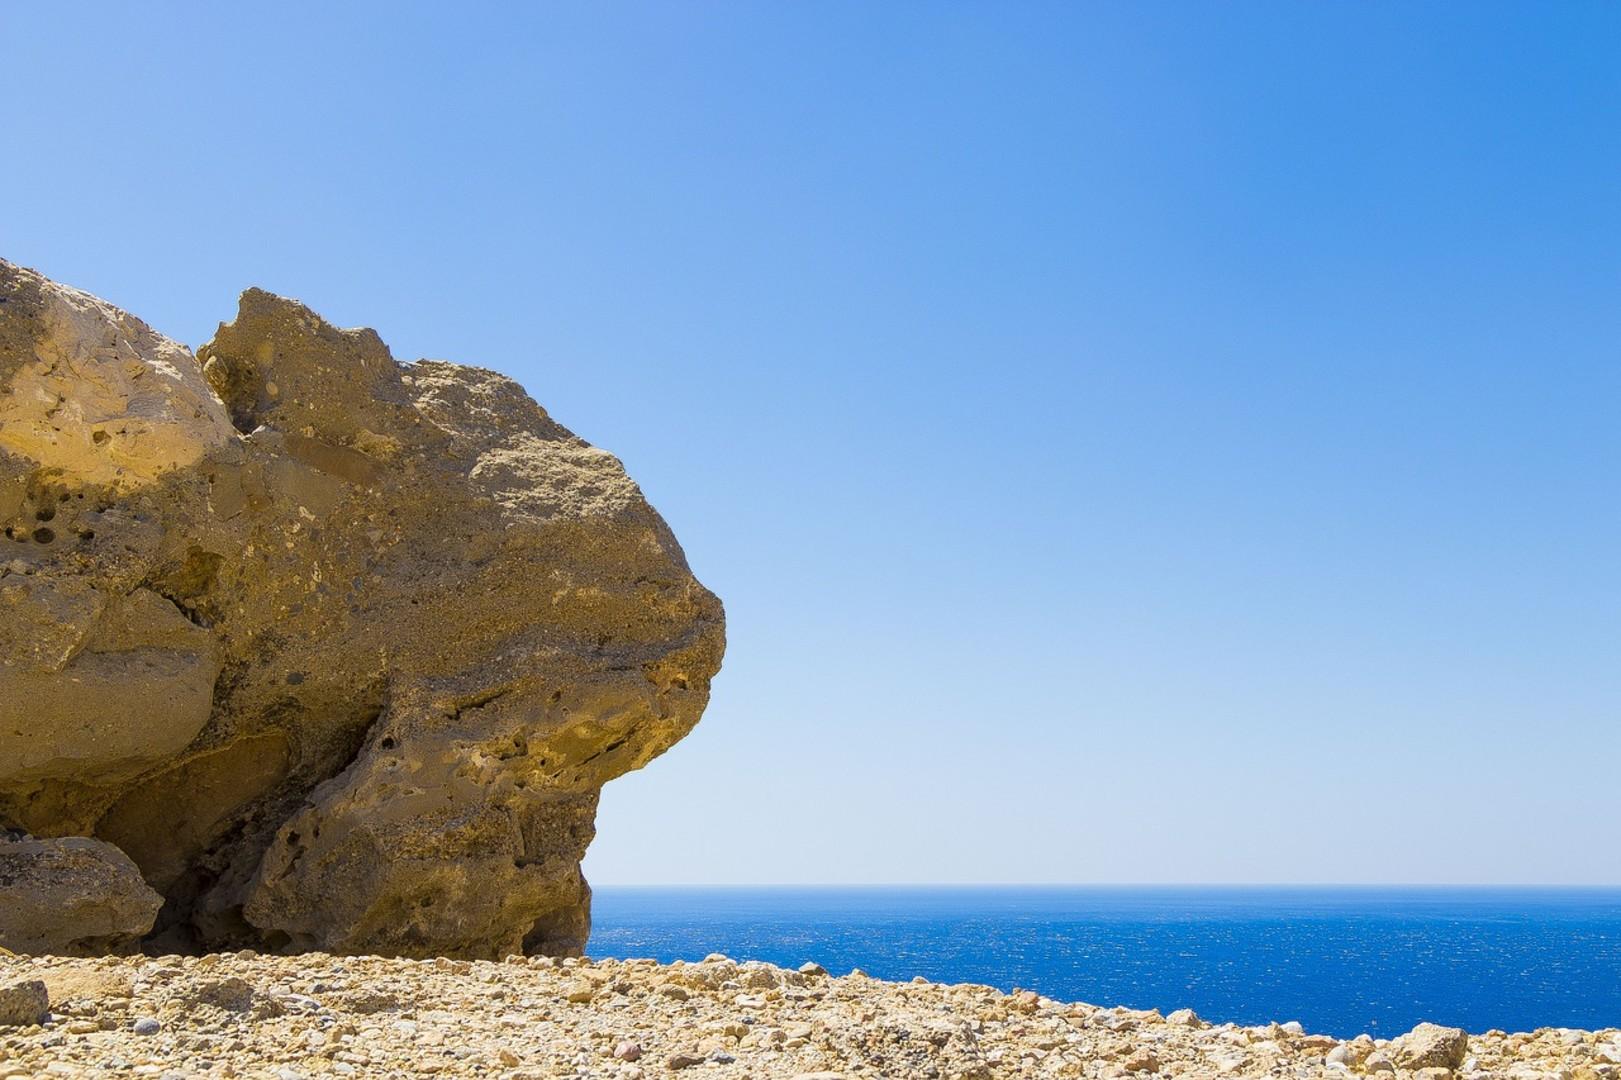 crete-2667029_1280.jpg